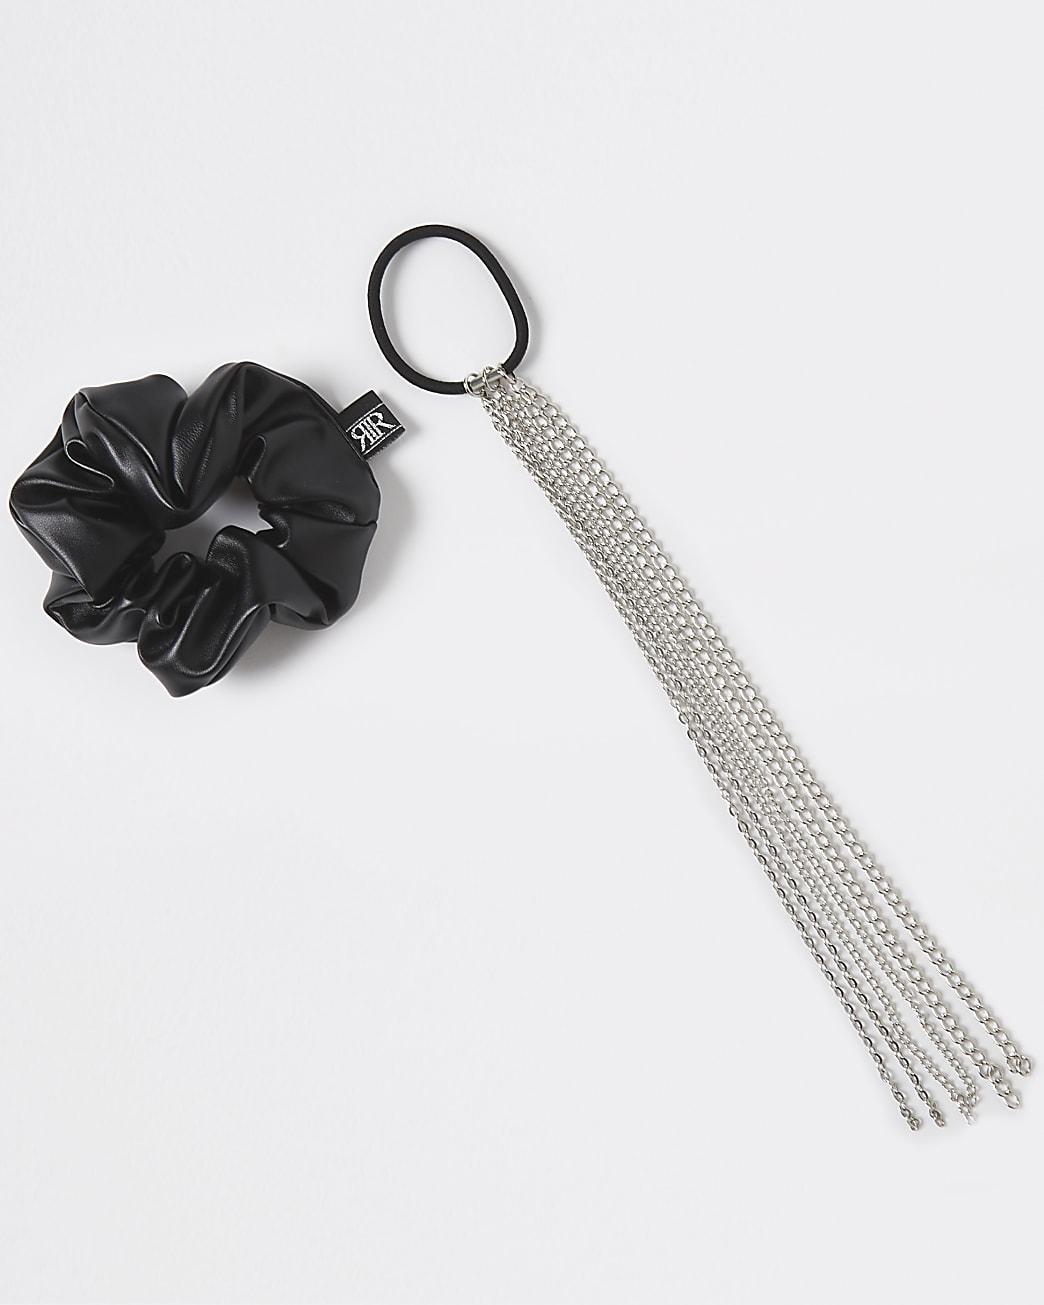 Black PU scrunchie and chain bobble